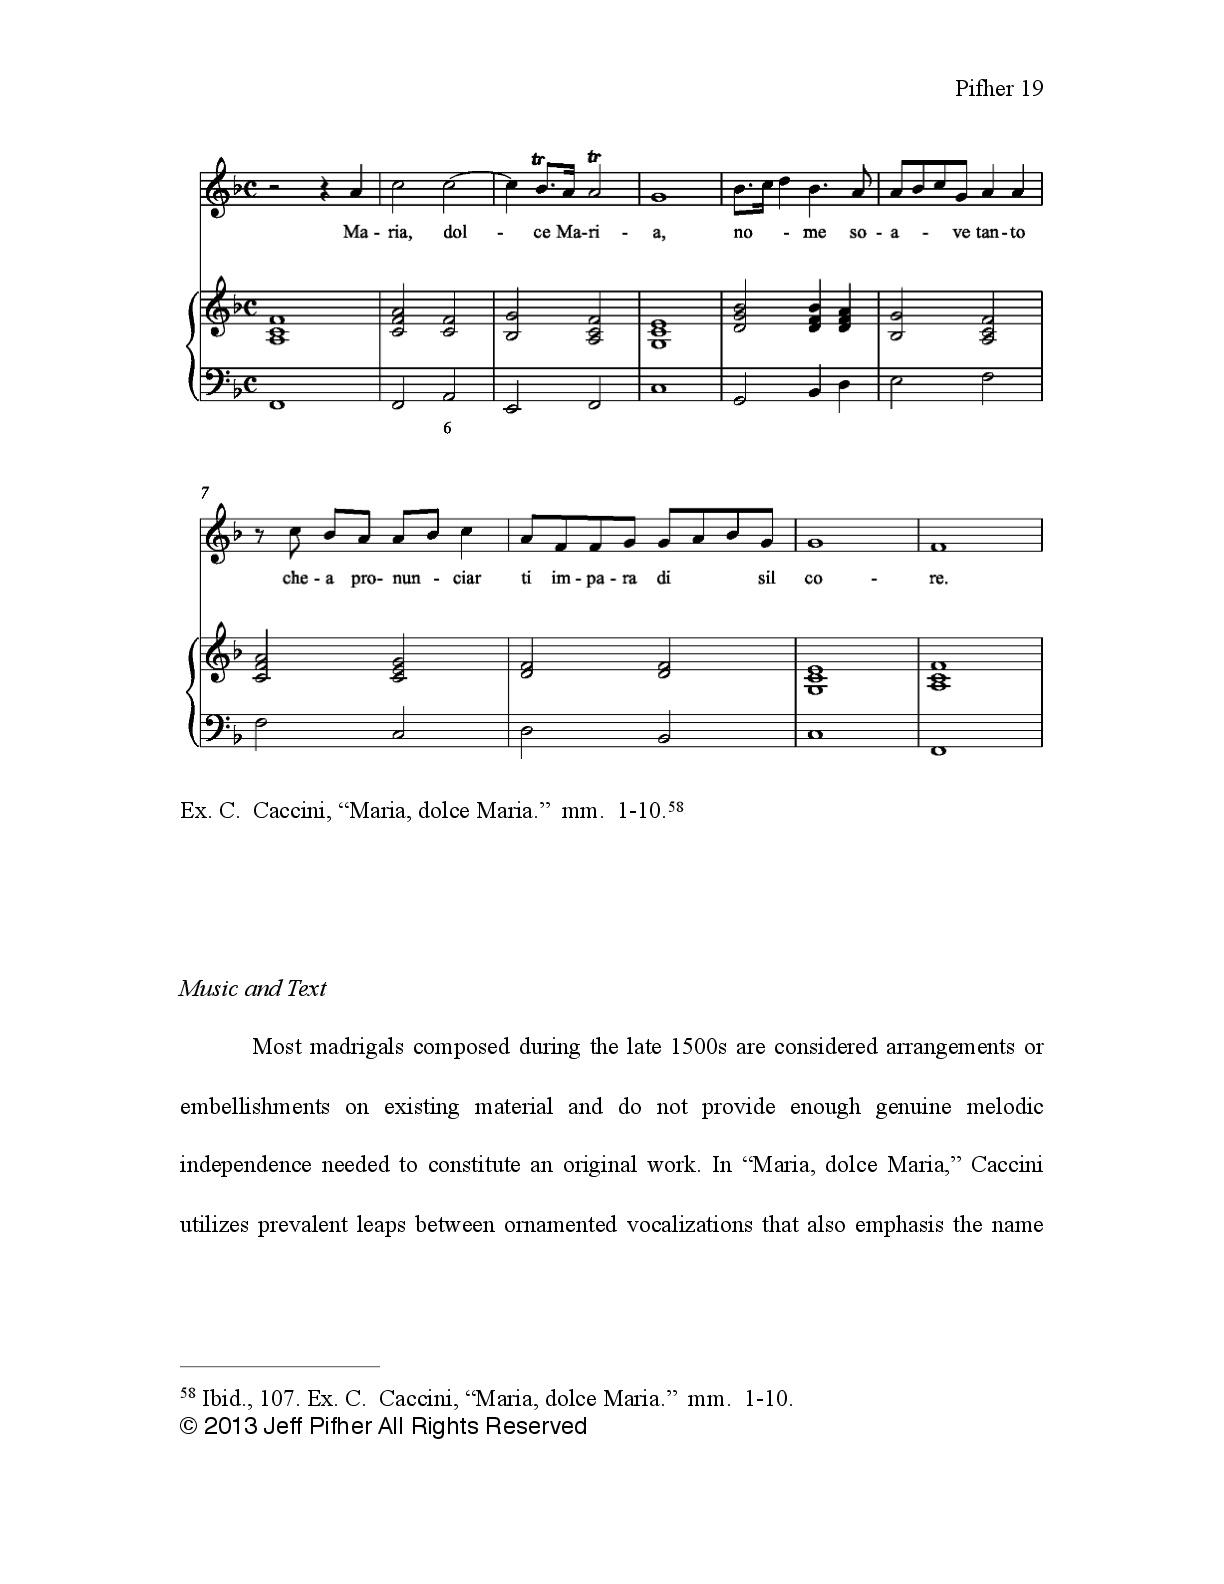 Jeff-Pifher-Music-and-Mediciean-Influences-(Academic-Series)-019.jpg